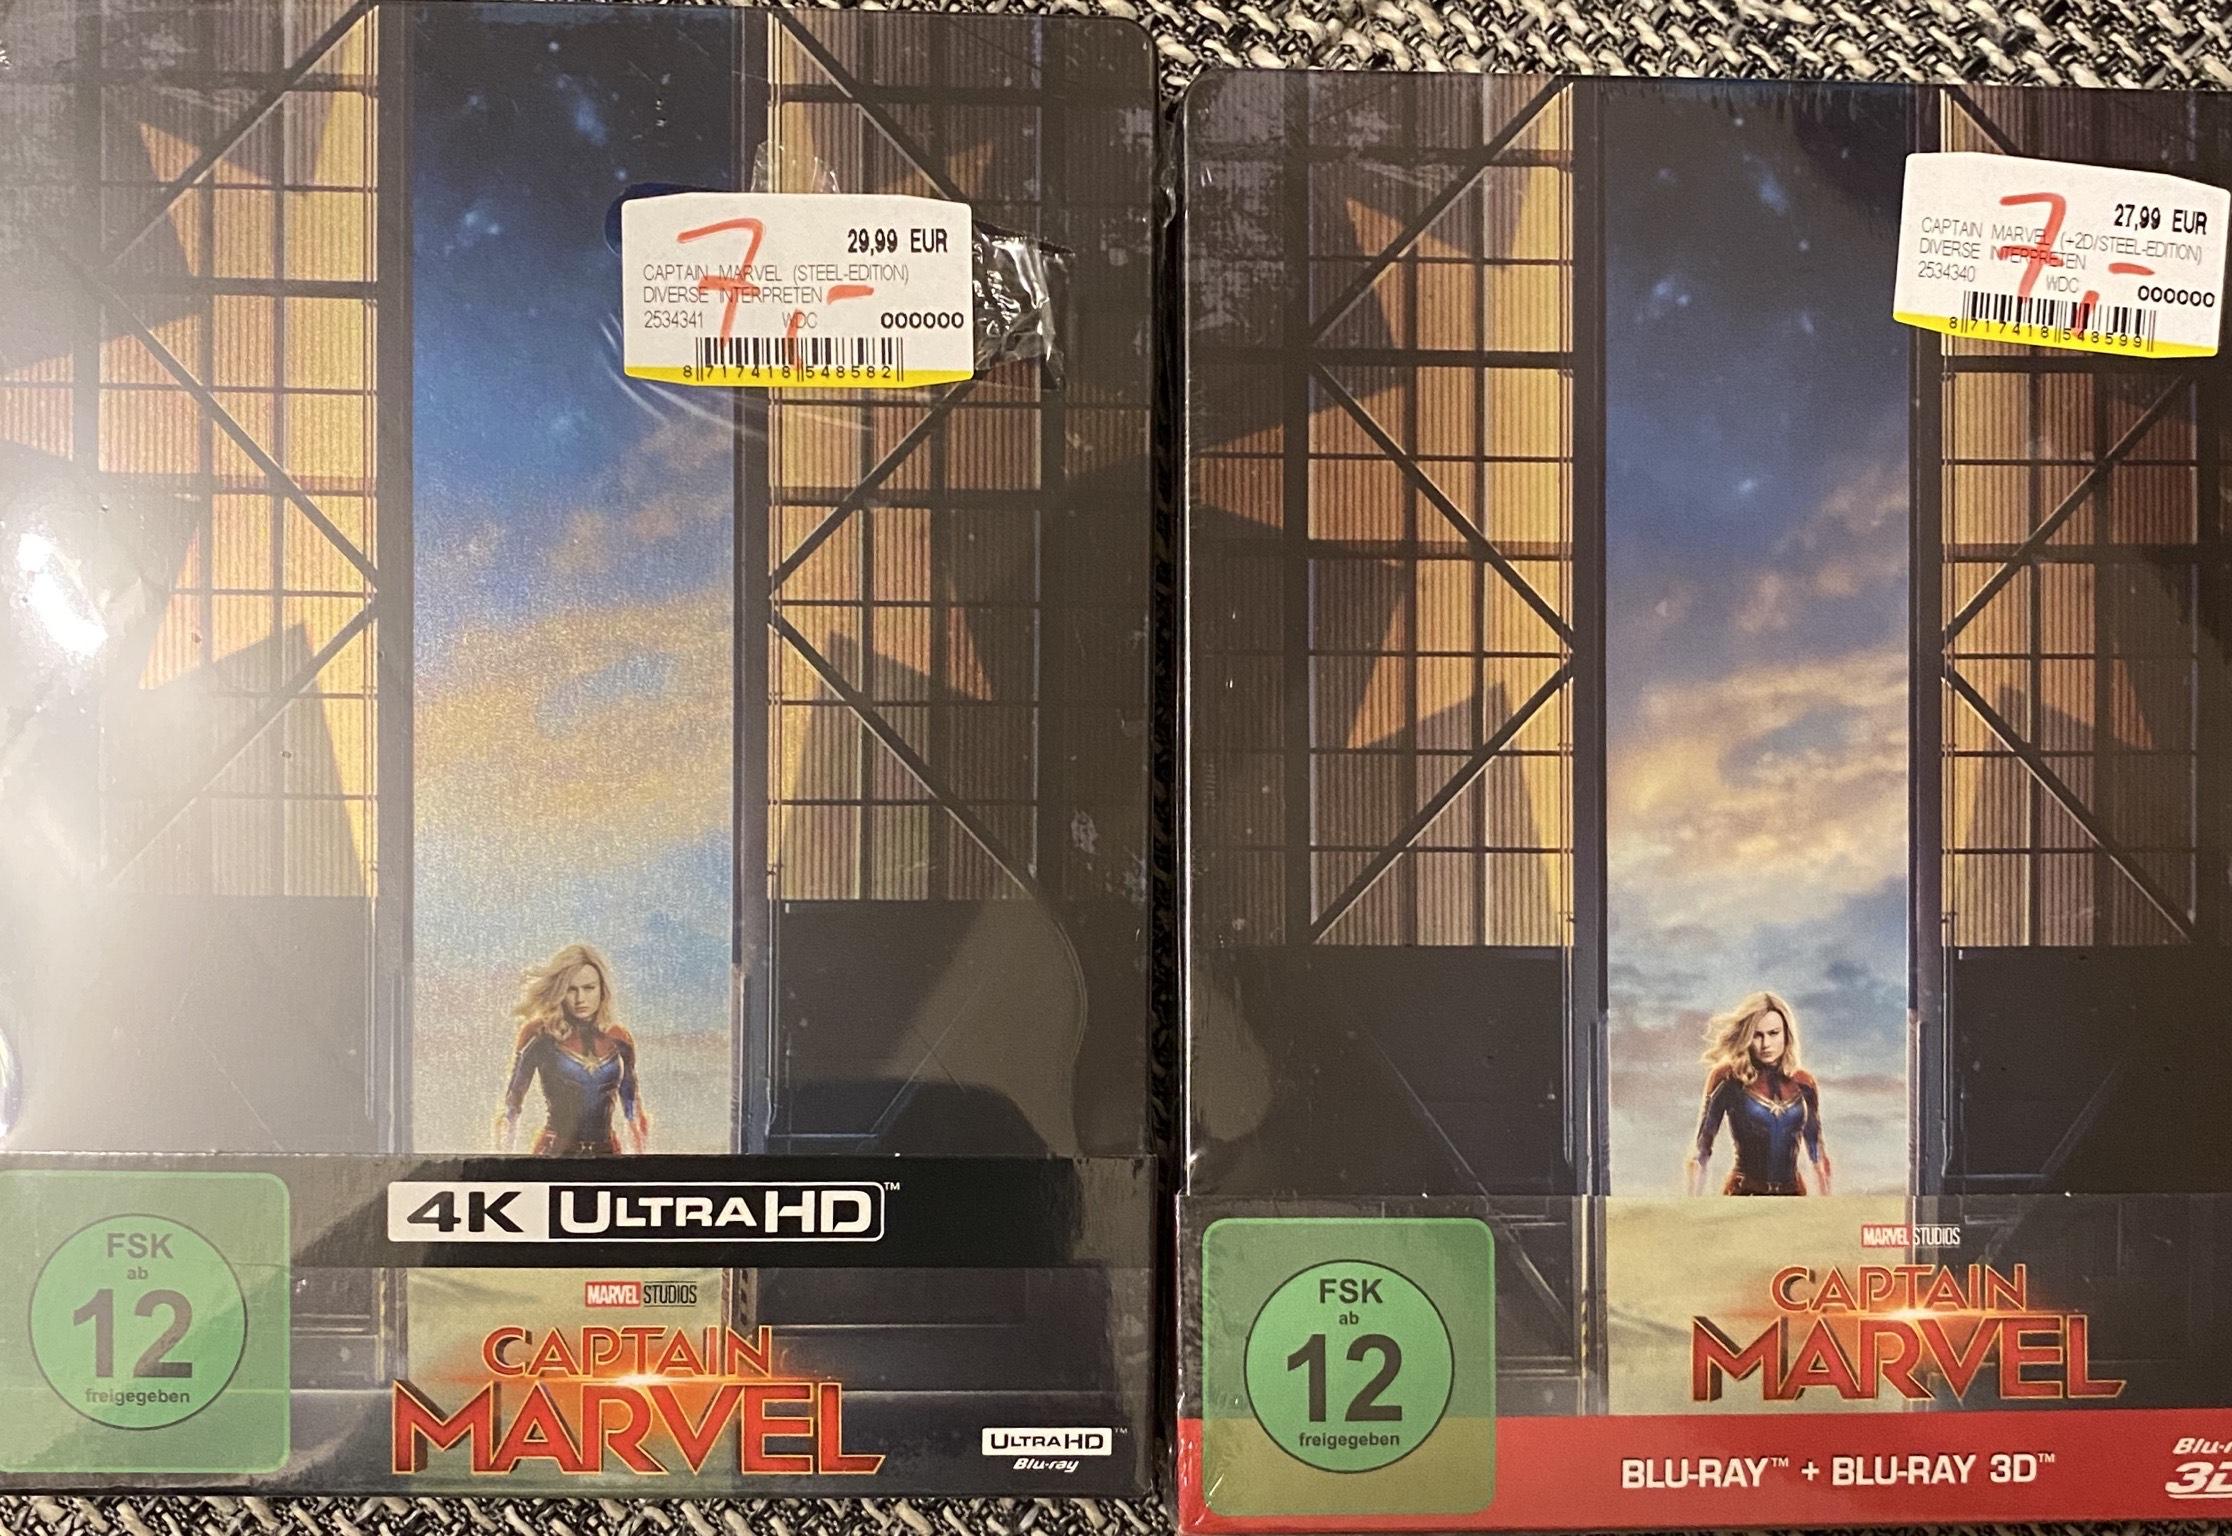 Lokal Duisburg Captain Marvel Steelbook 3D / 4K